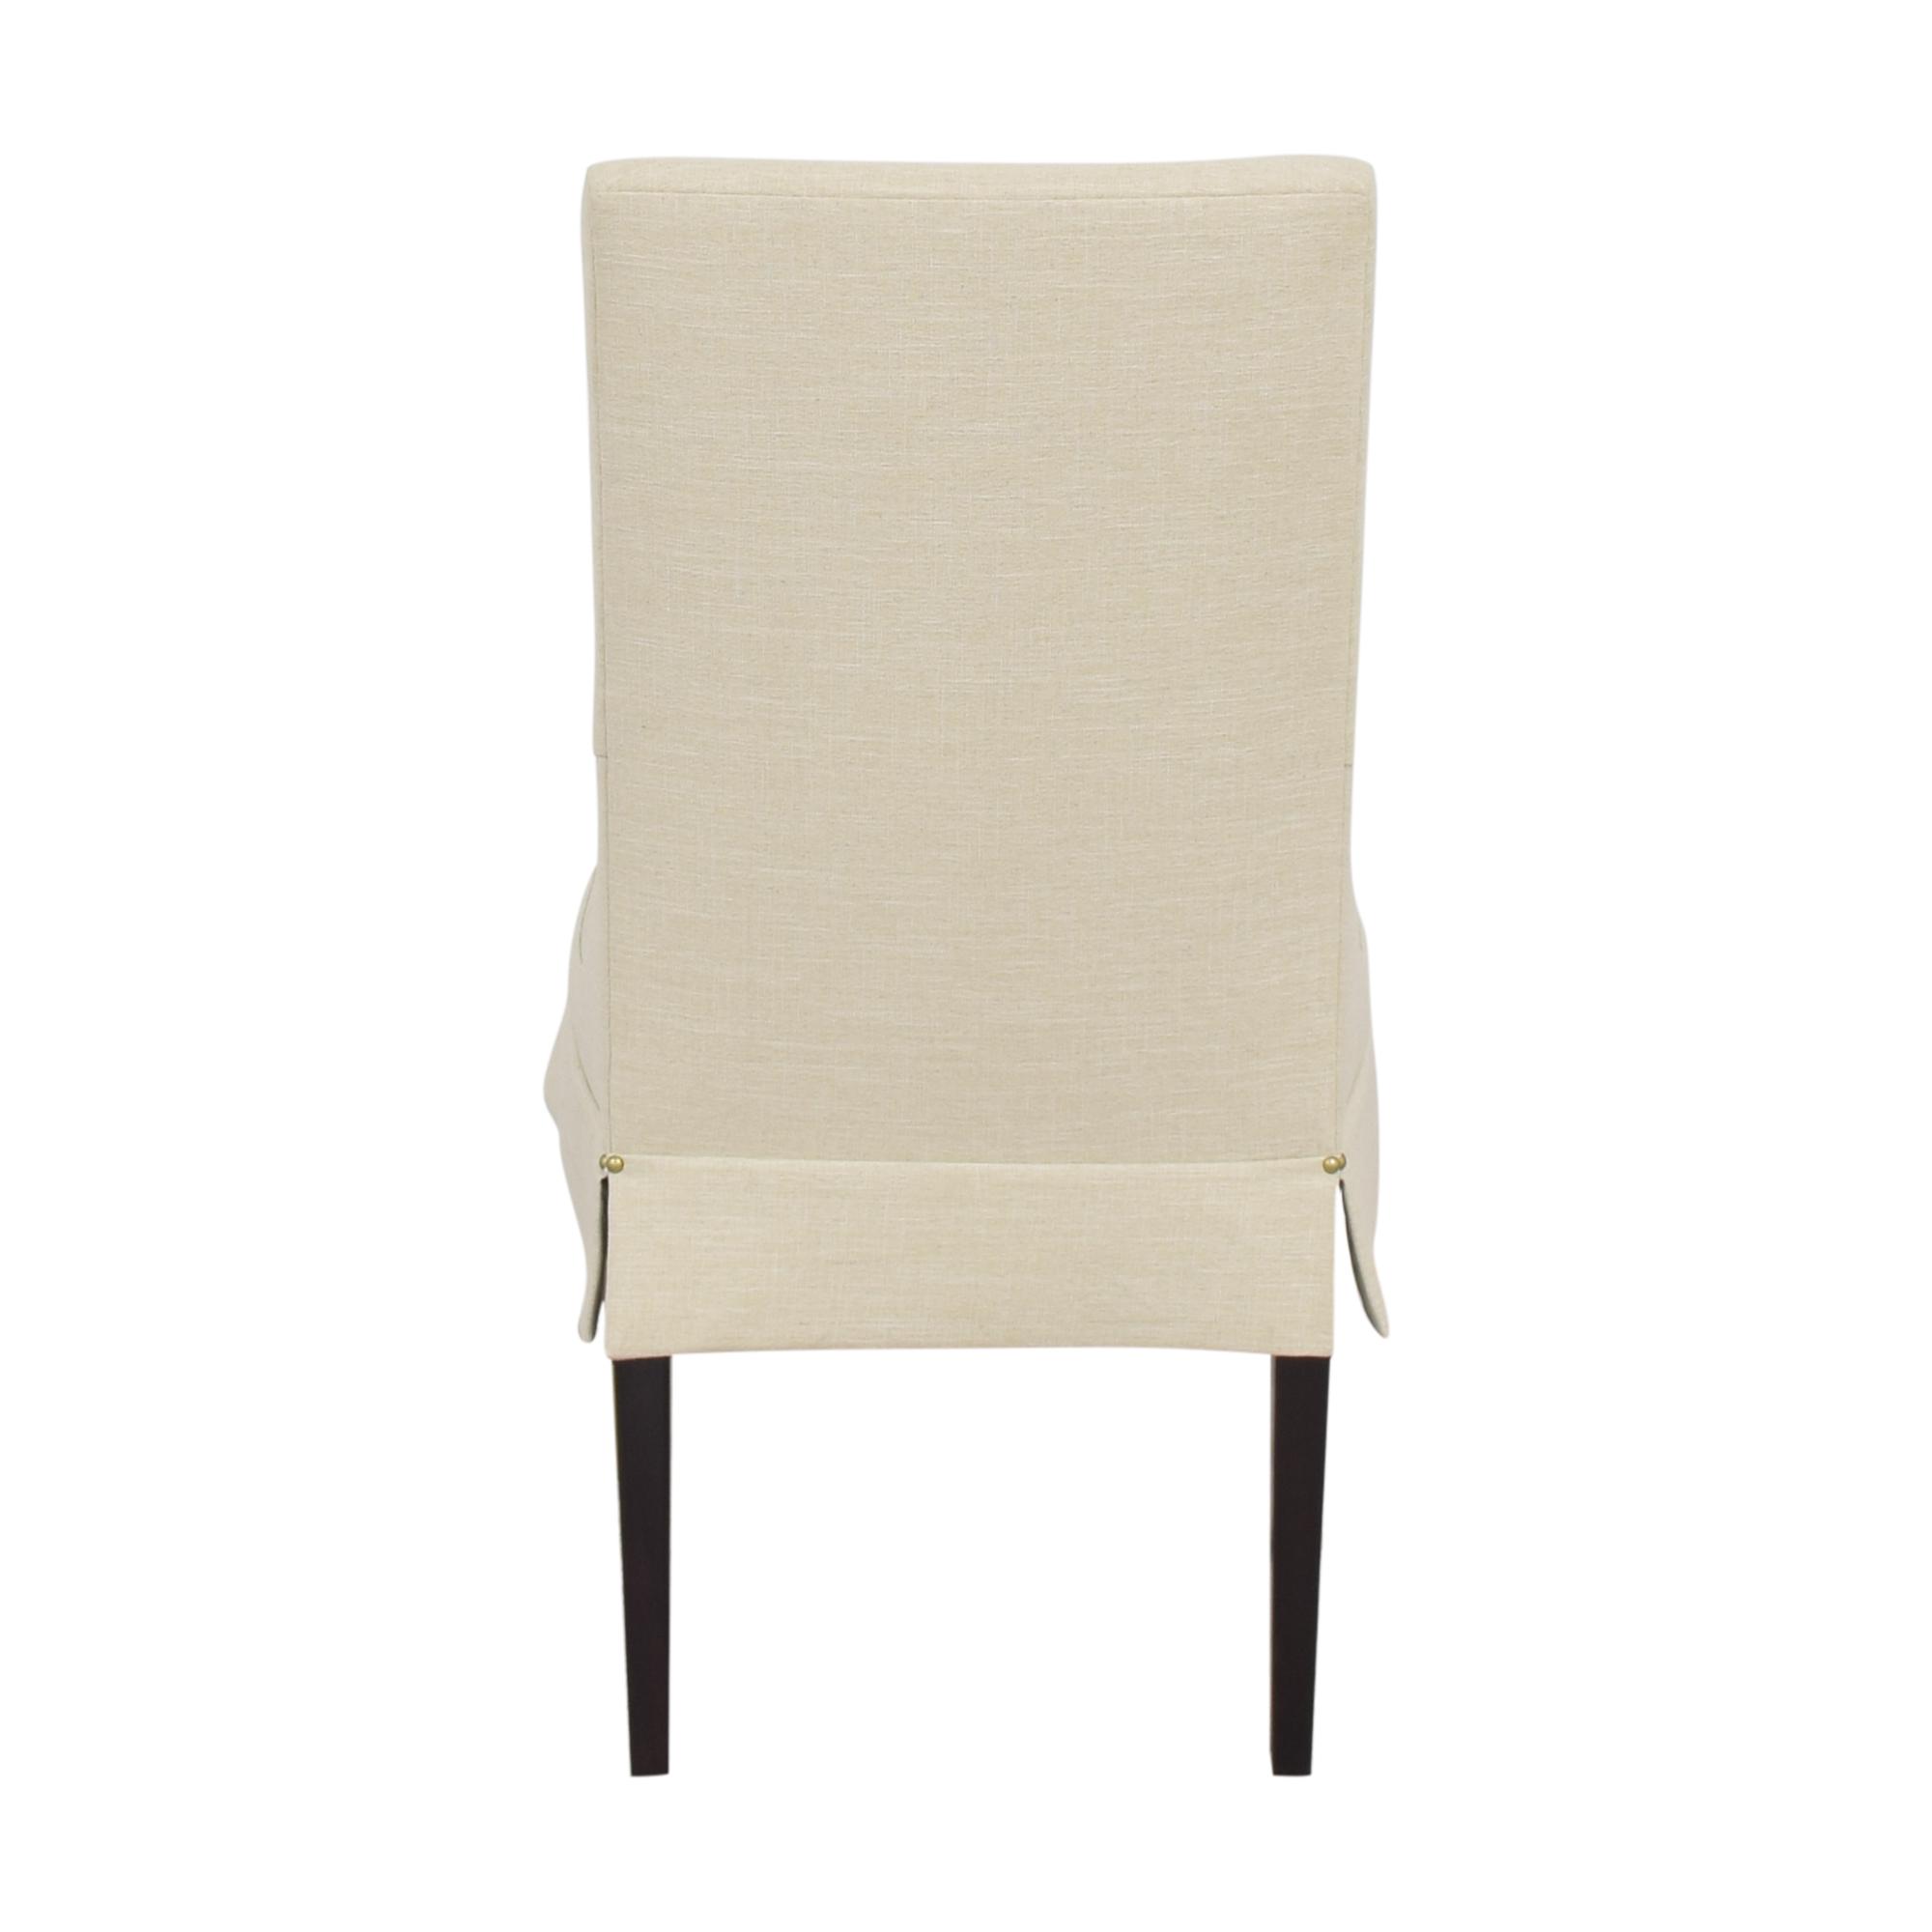 Lexington Furniture Lexington Furniture Carlyle Upholstered Parsons Chair dimensions